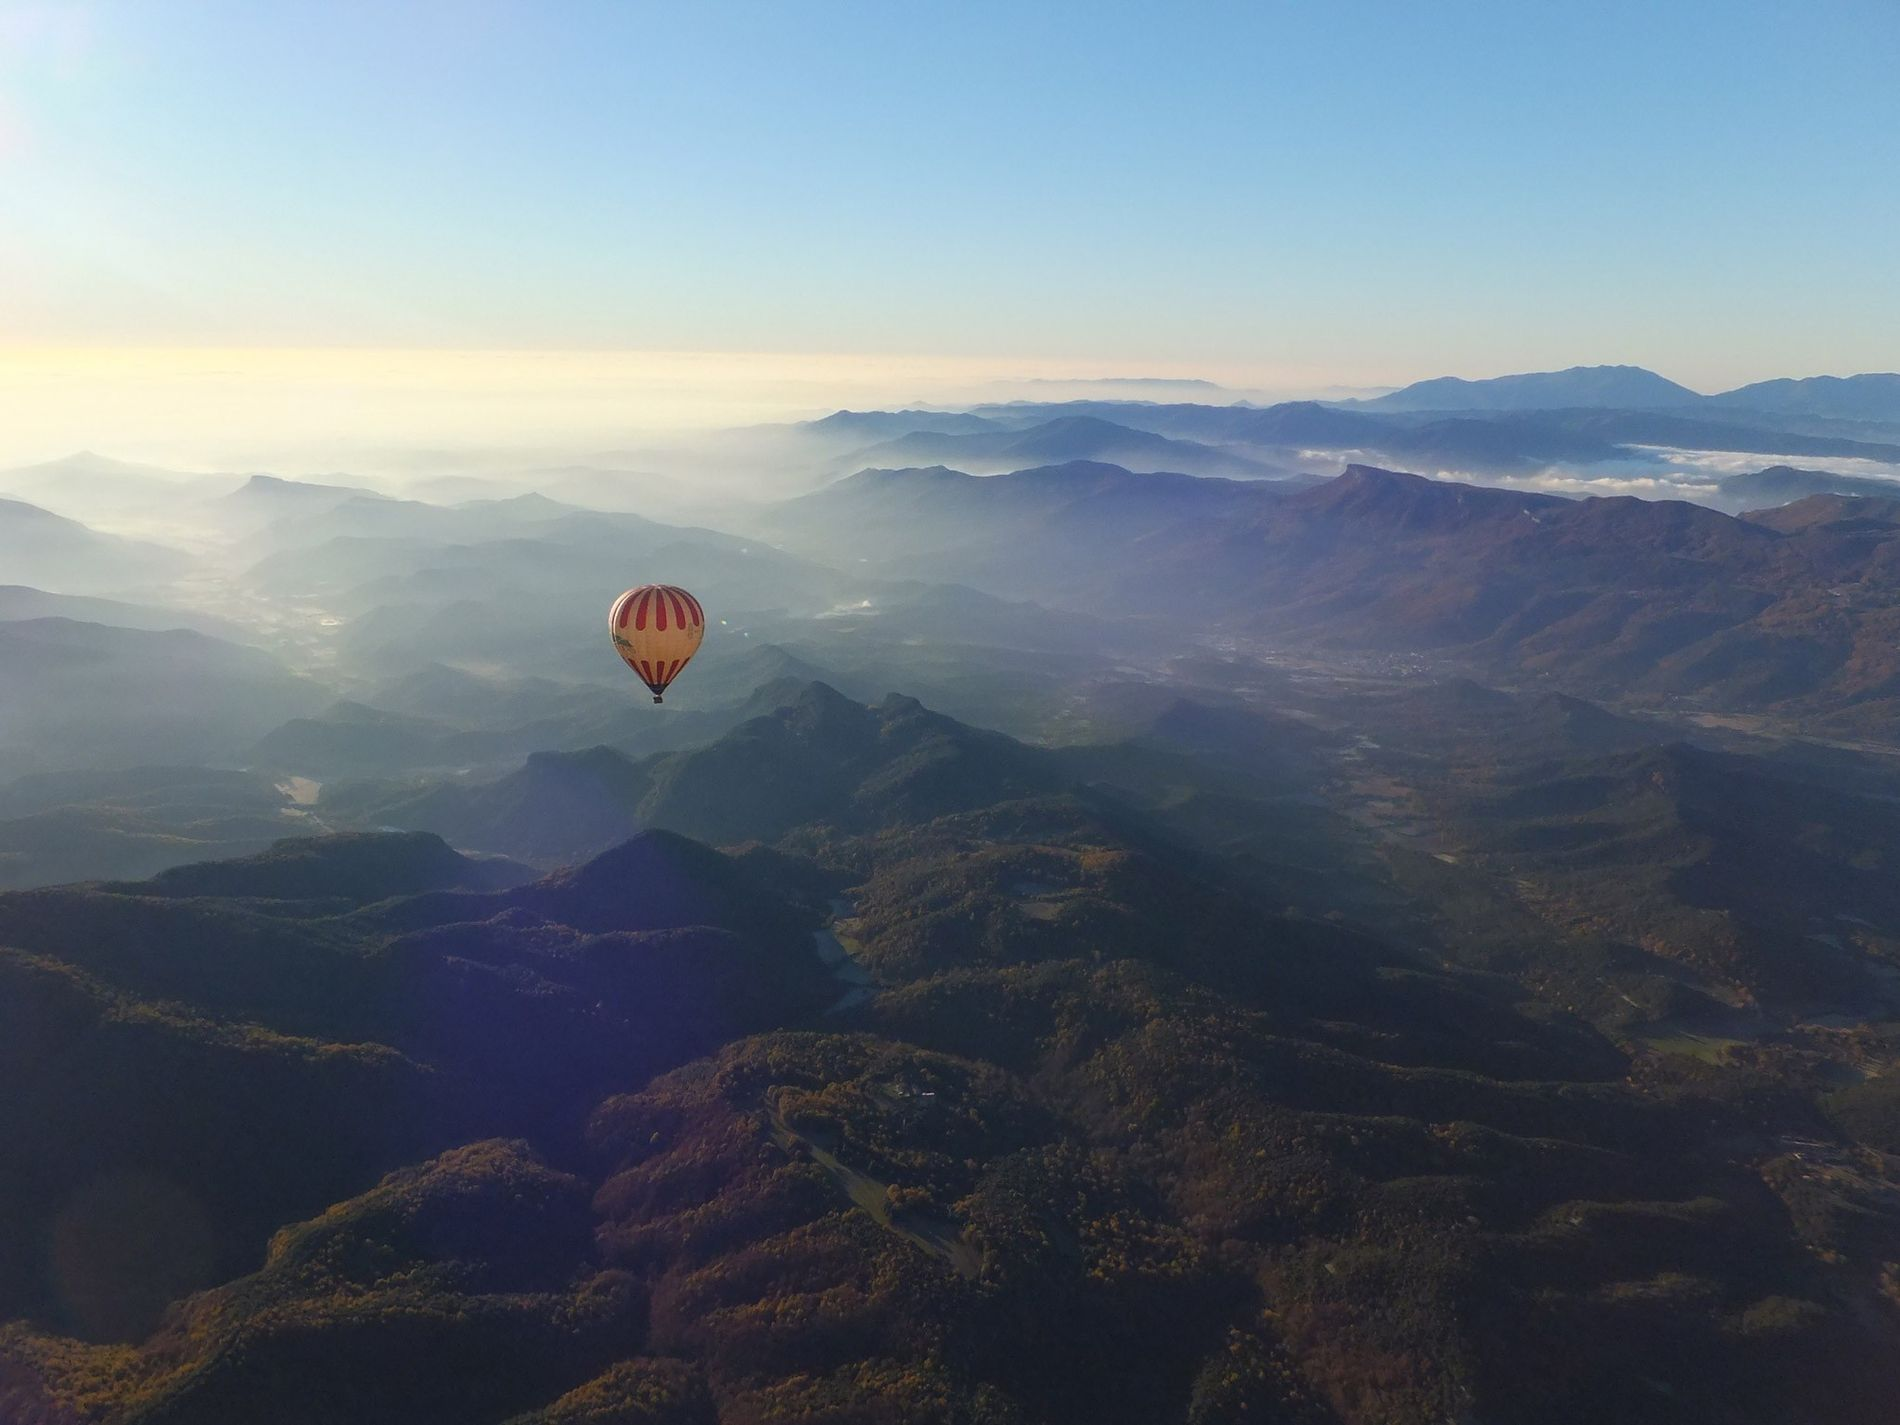 <p>Hot-air ballon riders take in the scenic views of Garrotxa Volcanic Natural Park Catalonia.</p>